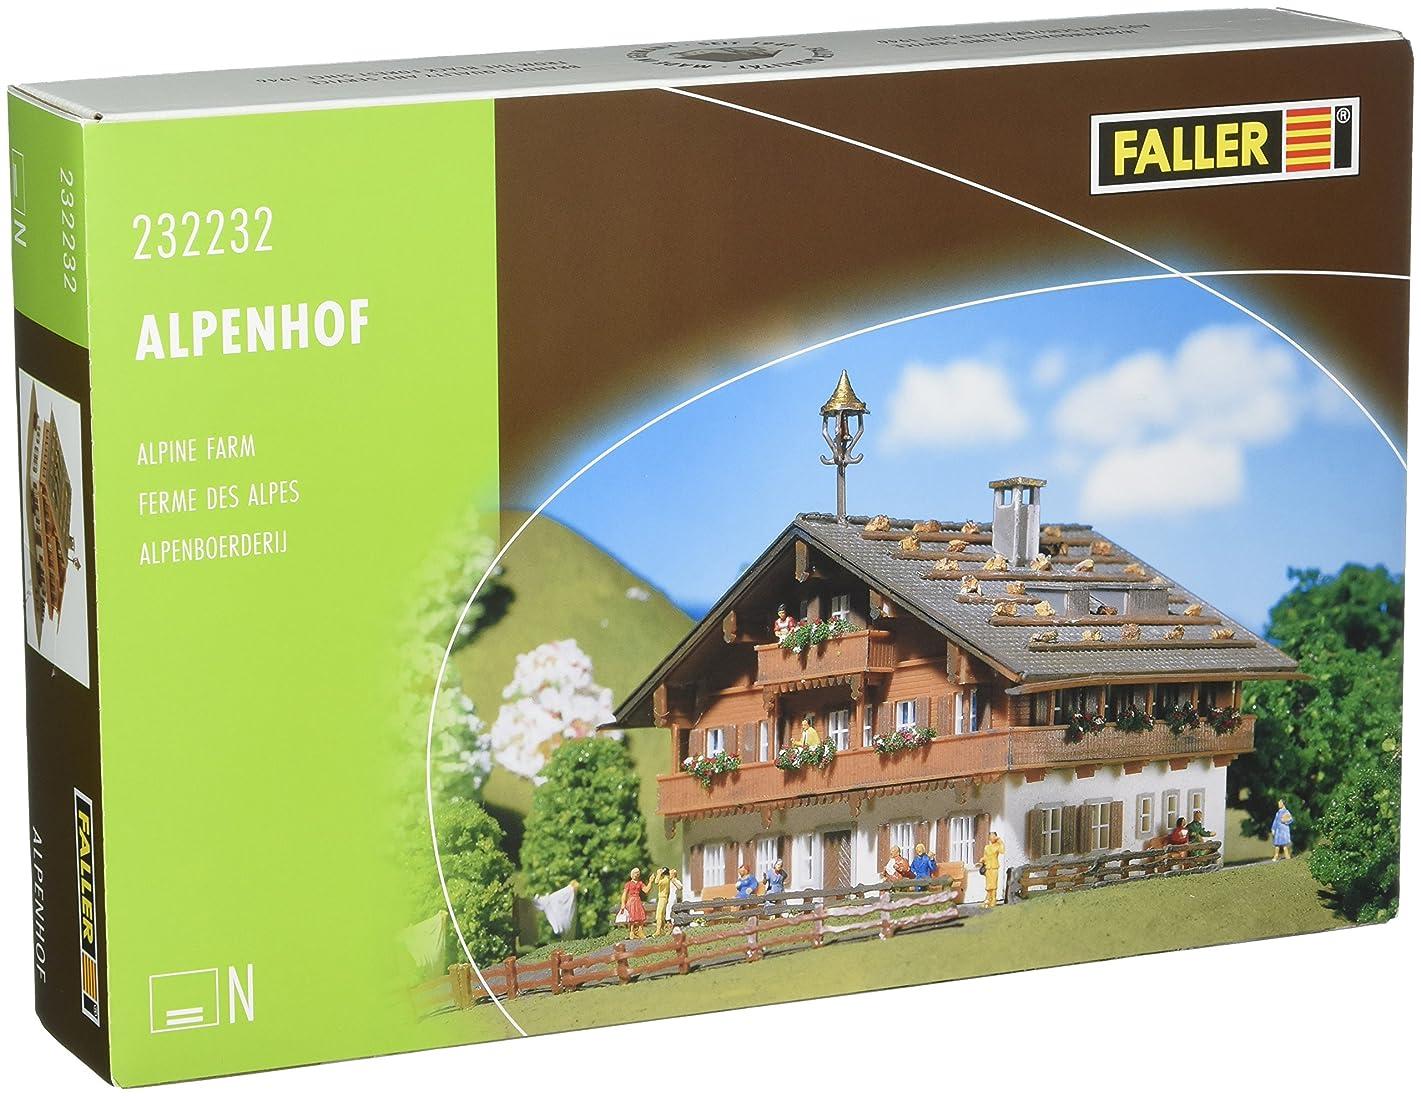 Faller 232232 Alpine Farm House N Scale Building Kit